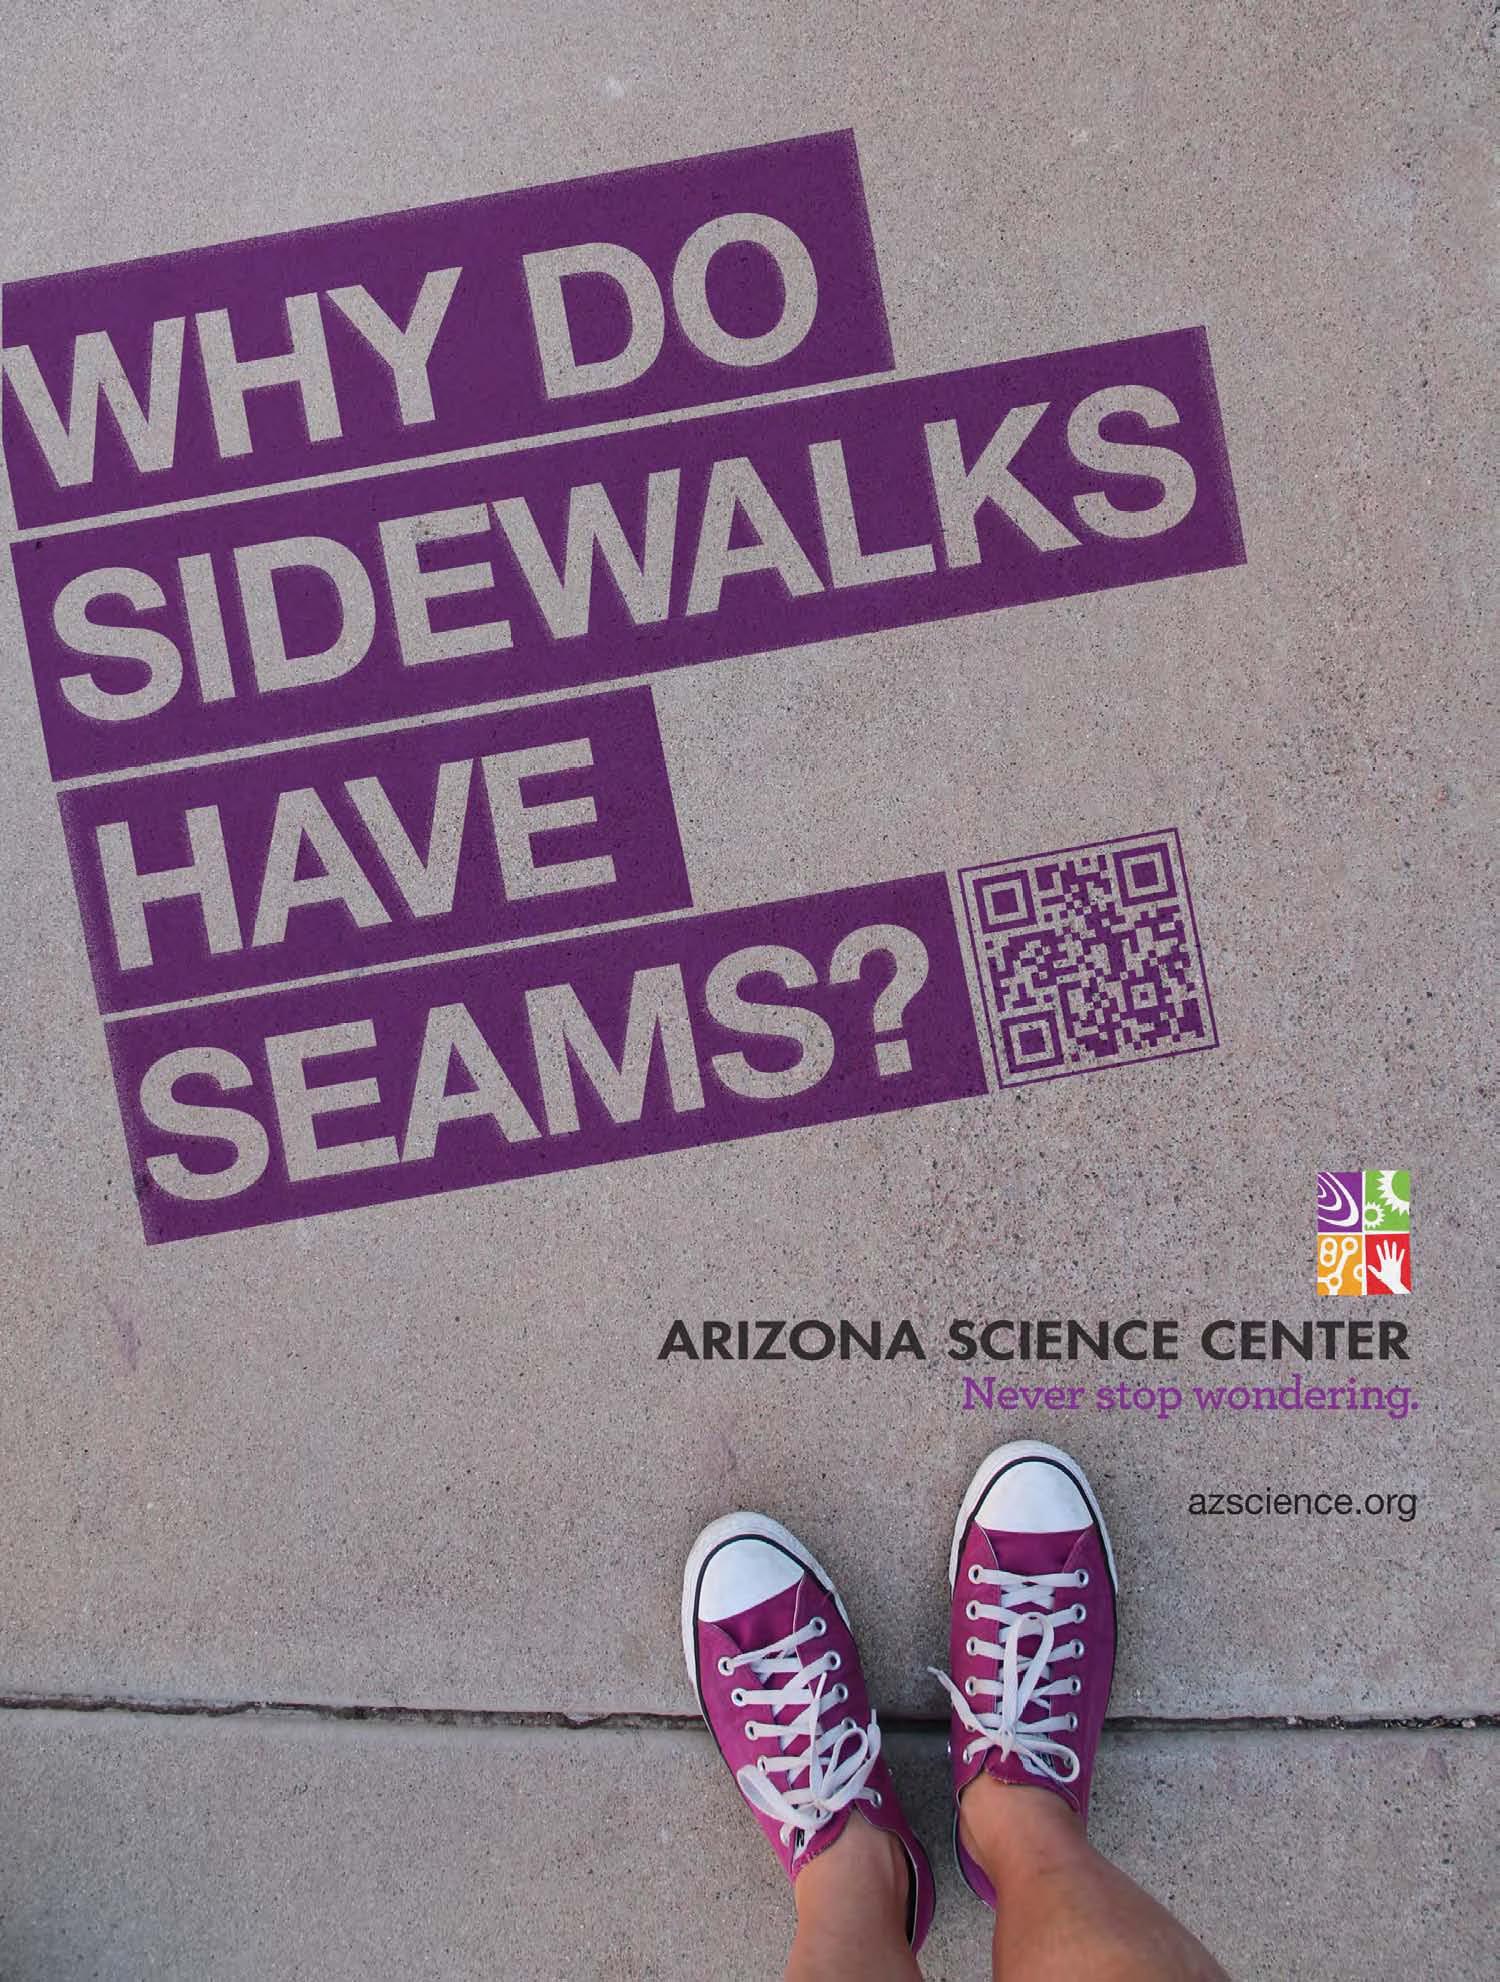 Arizona Science Center Outdoor Ad -  Never stop wondering, Sidewalk seams